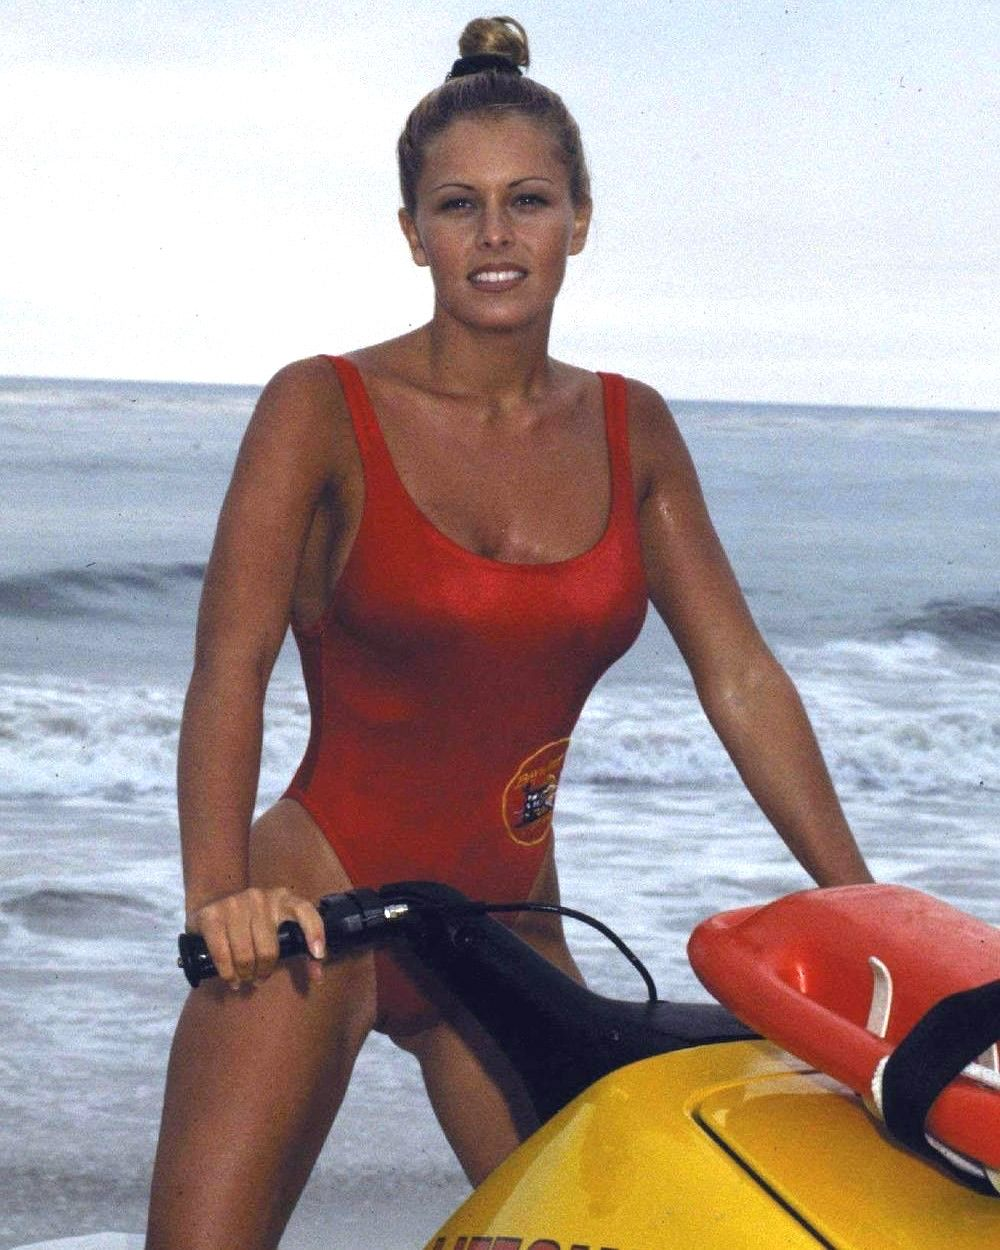 Nicole Eggert as Summer Quinn in Baywatch, jet ski